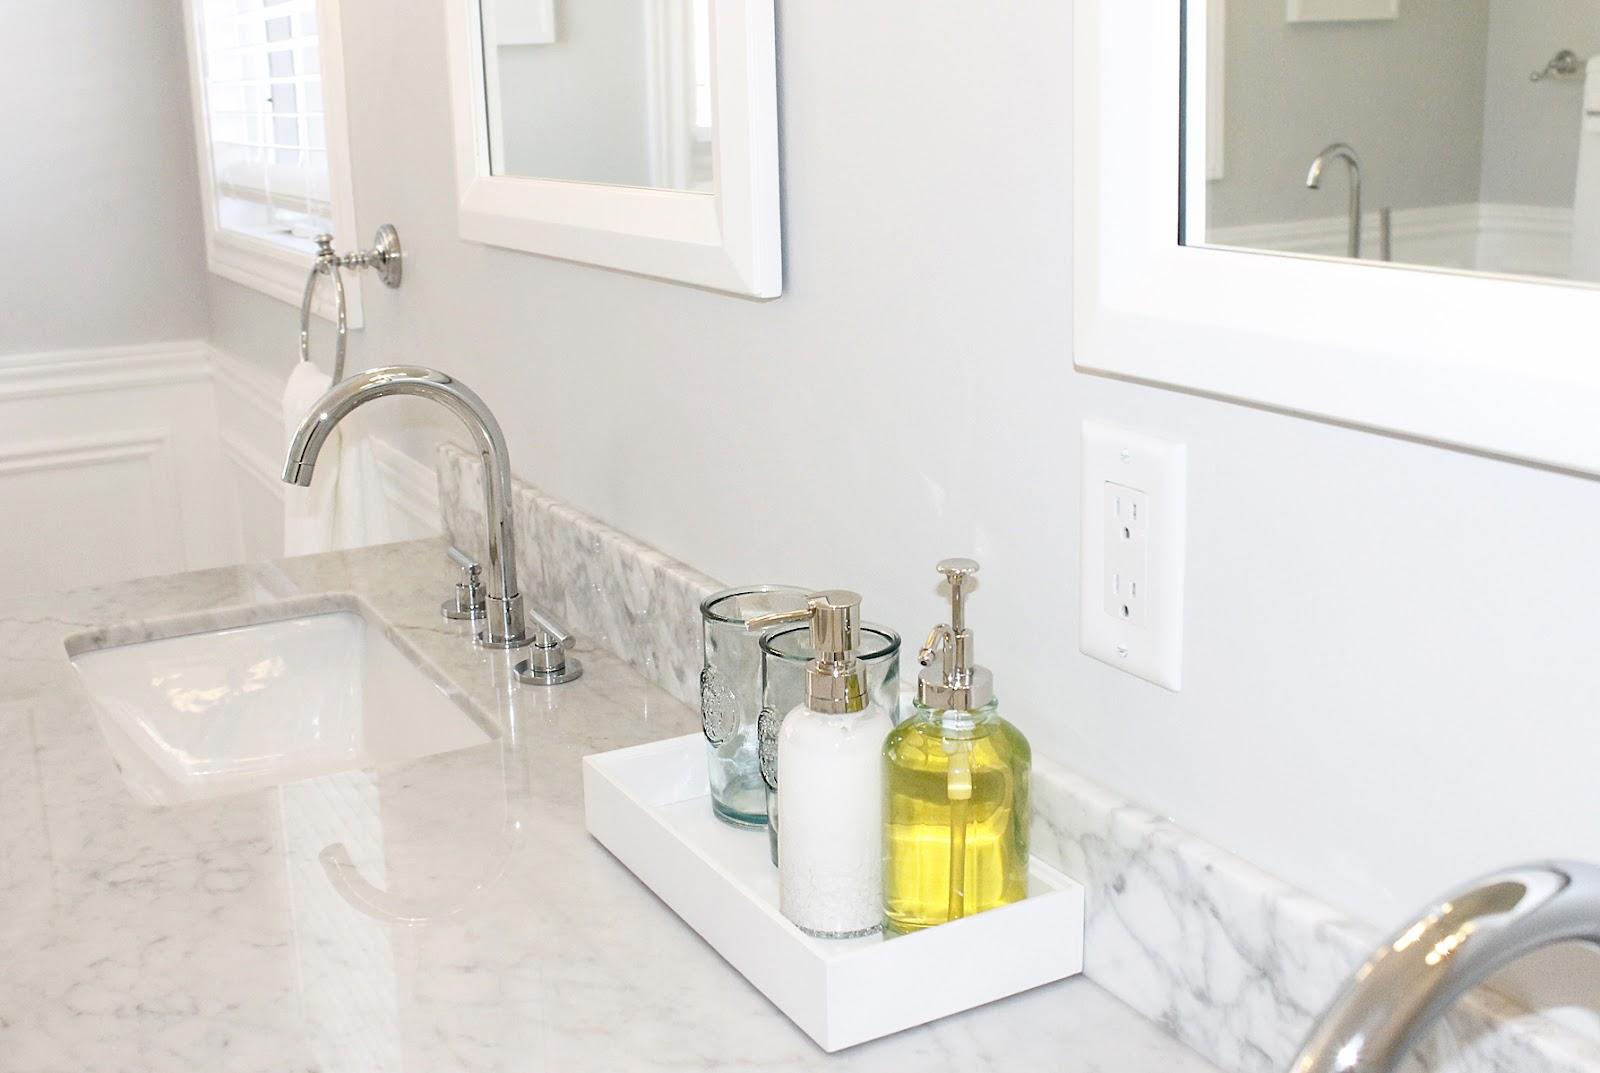 vintage bathroom fixtures, Home decor